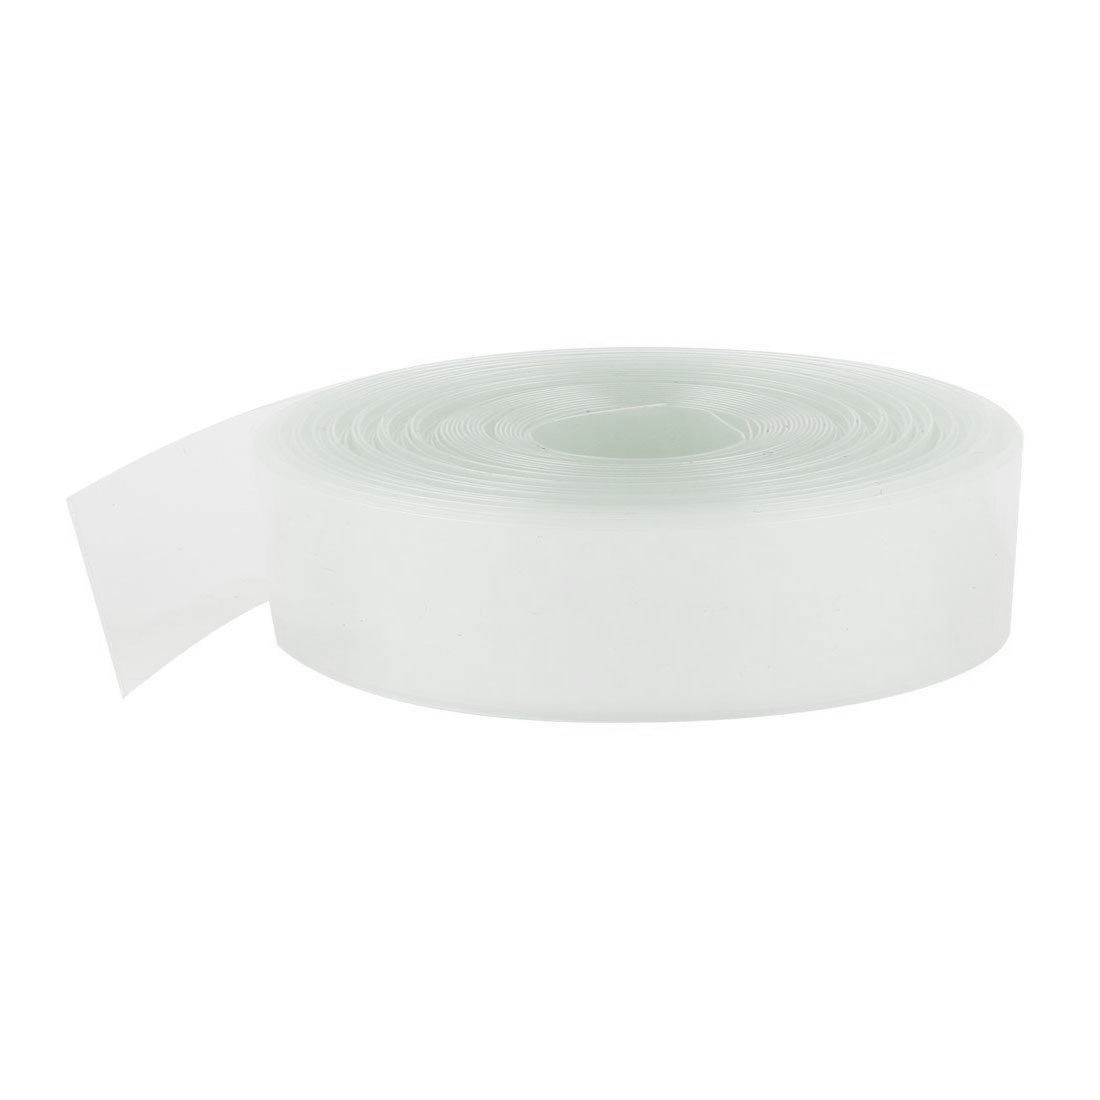 10Meters 23mm Width PVC Heat Shrink Wrap Tube Clear for 1 x AA Battery